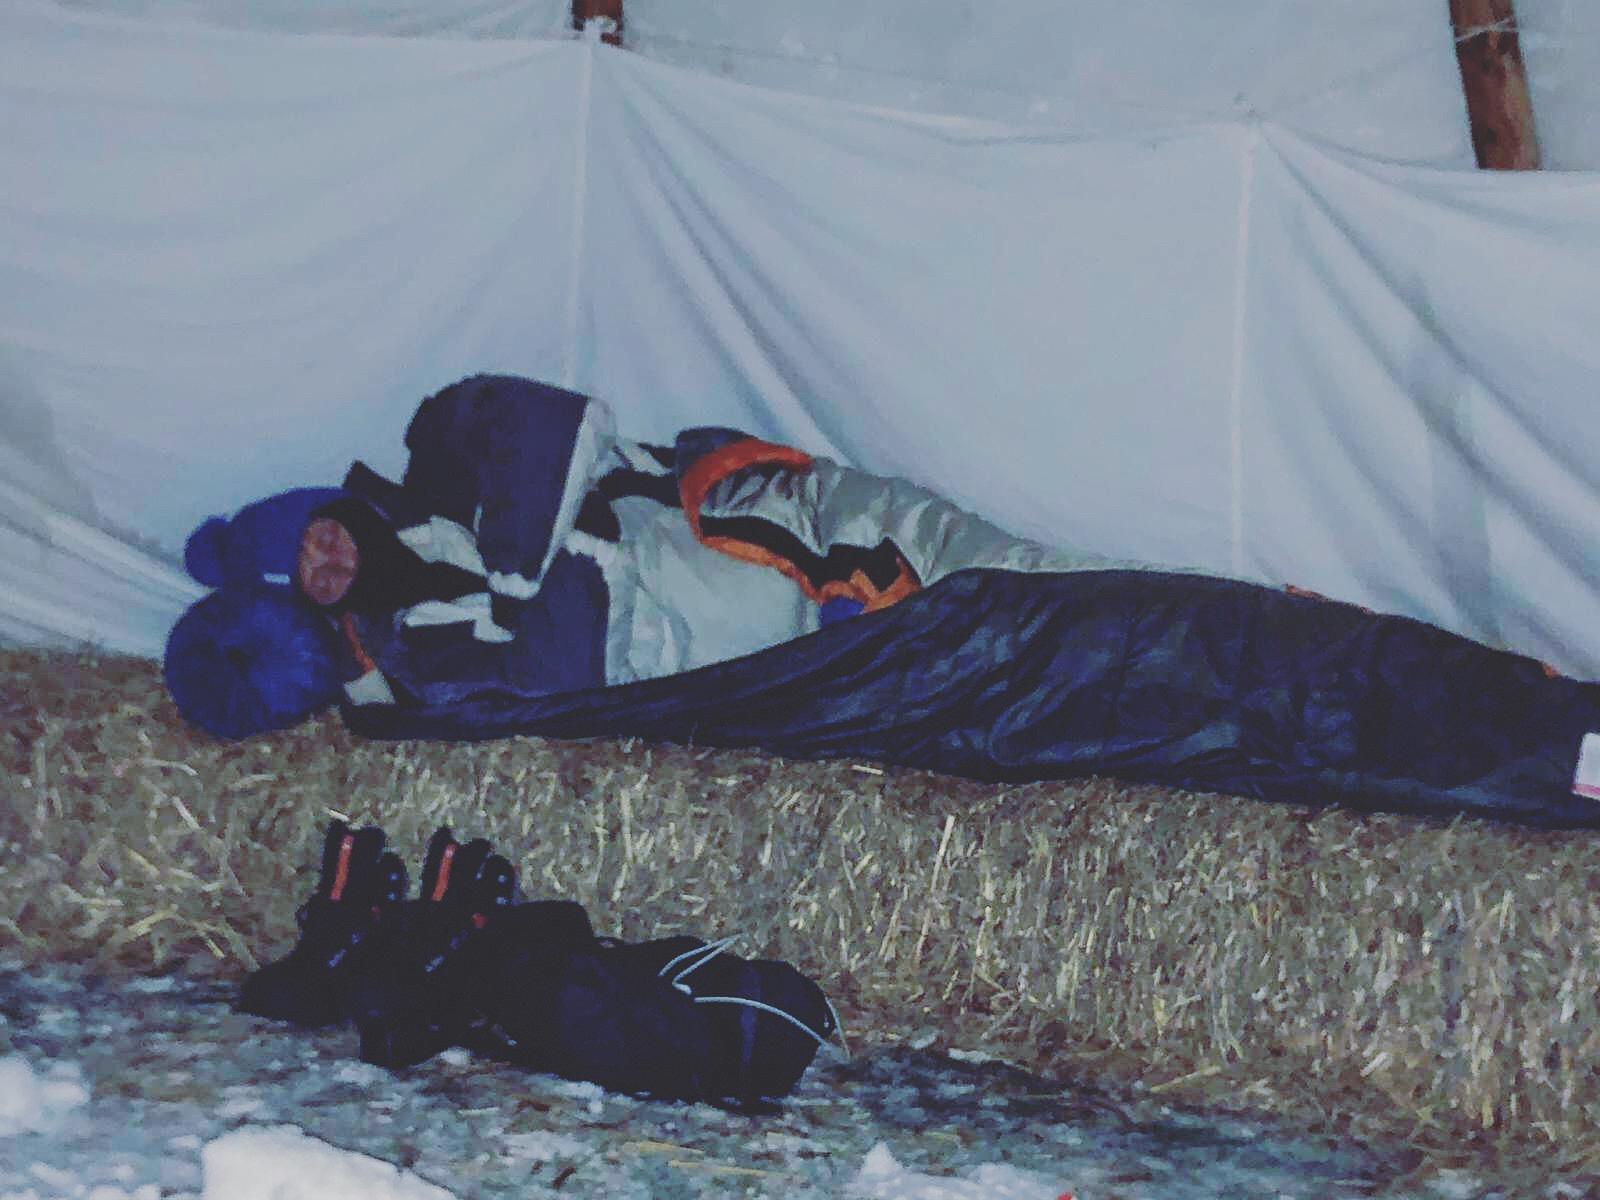 -6ºC - Davos, Switzerland